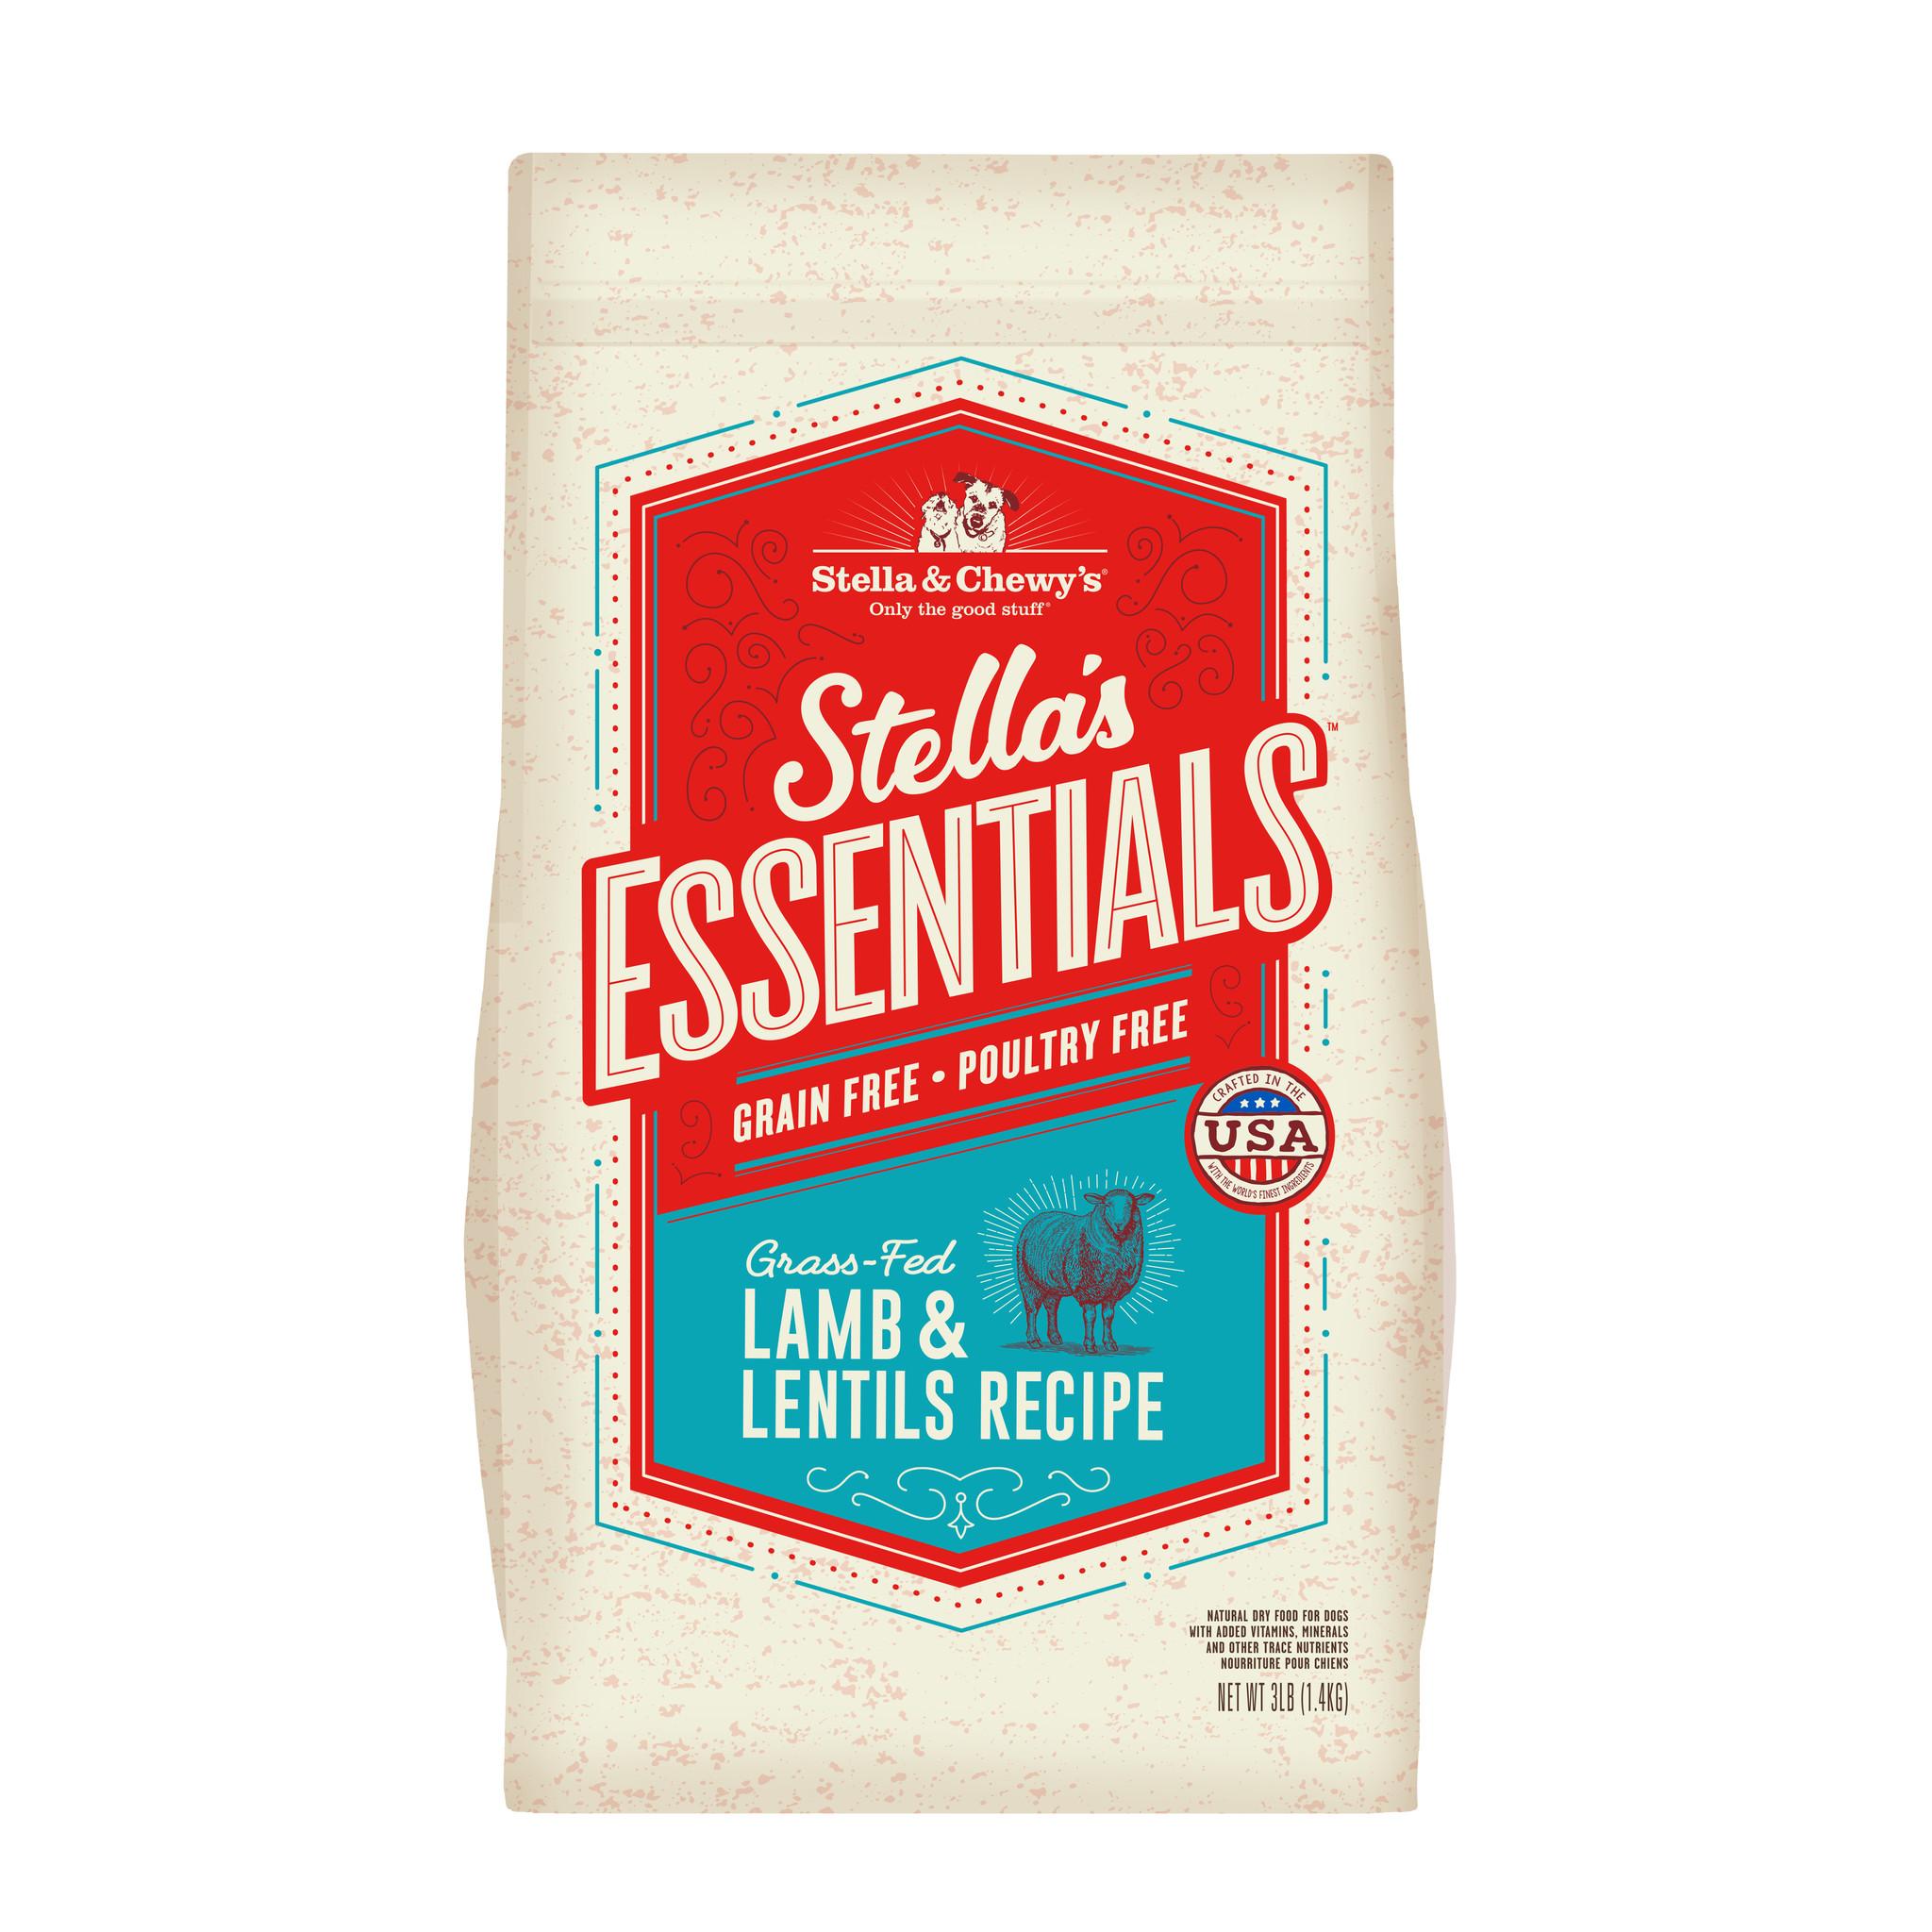 Stella & Chewys Stella & Chewys Stella's Essentials Grain Free Lamb & Lentils Recipe